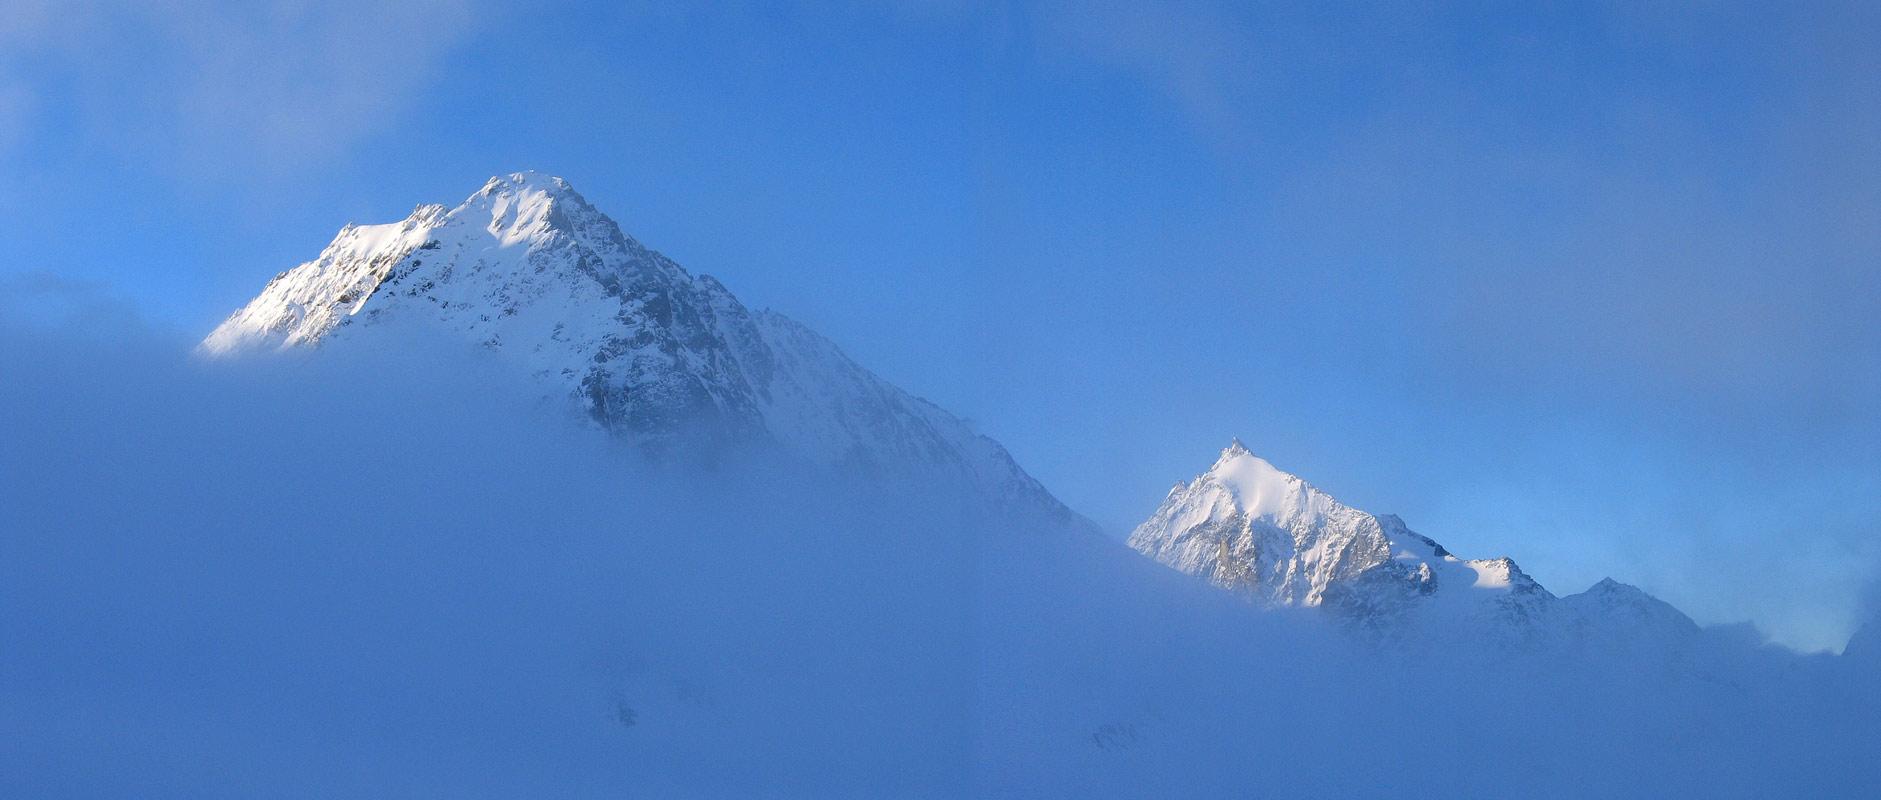 Col Valpelline, Day 6 H.R. Chamonix-Zermatt Walliser Alpen / Alpes valaisannes Švýcarsko panorama 23